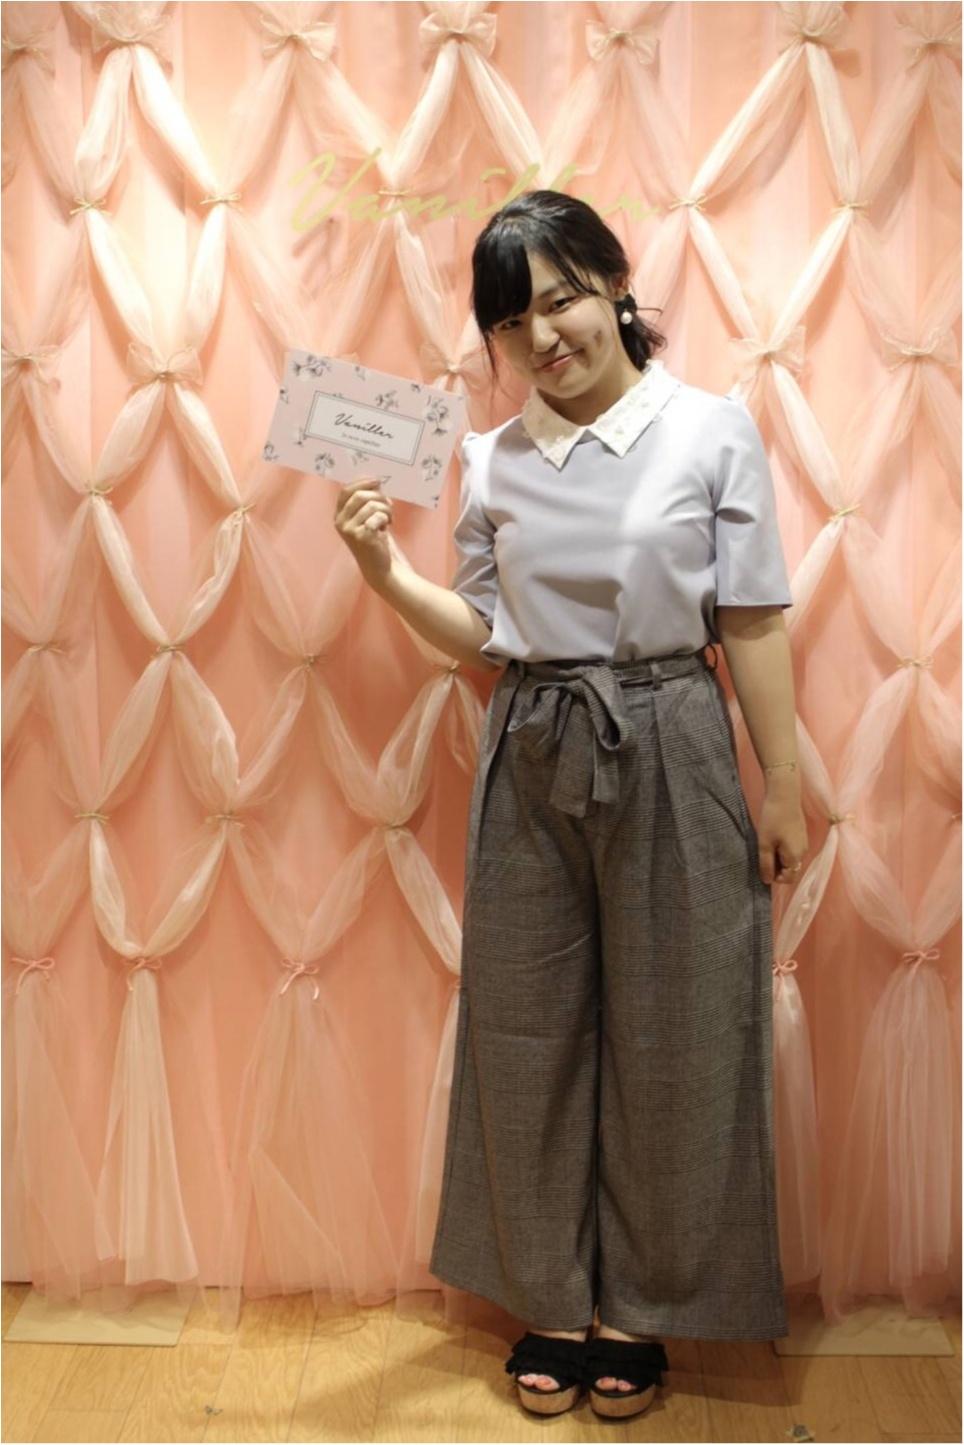 152cmが着る!夏服+秋の新作【GU・グレンチェックワイドパンツ】で即秋コーデ!!_3